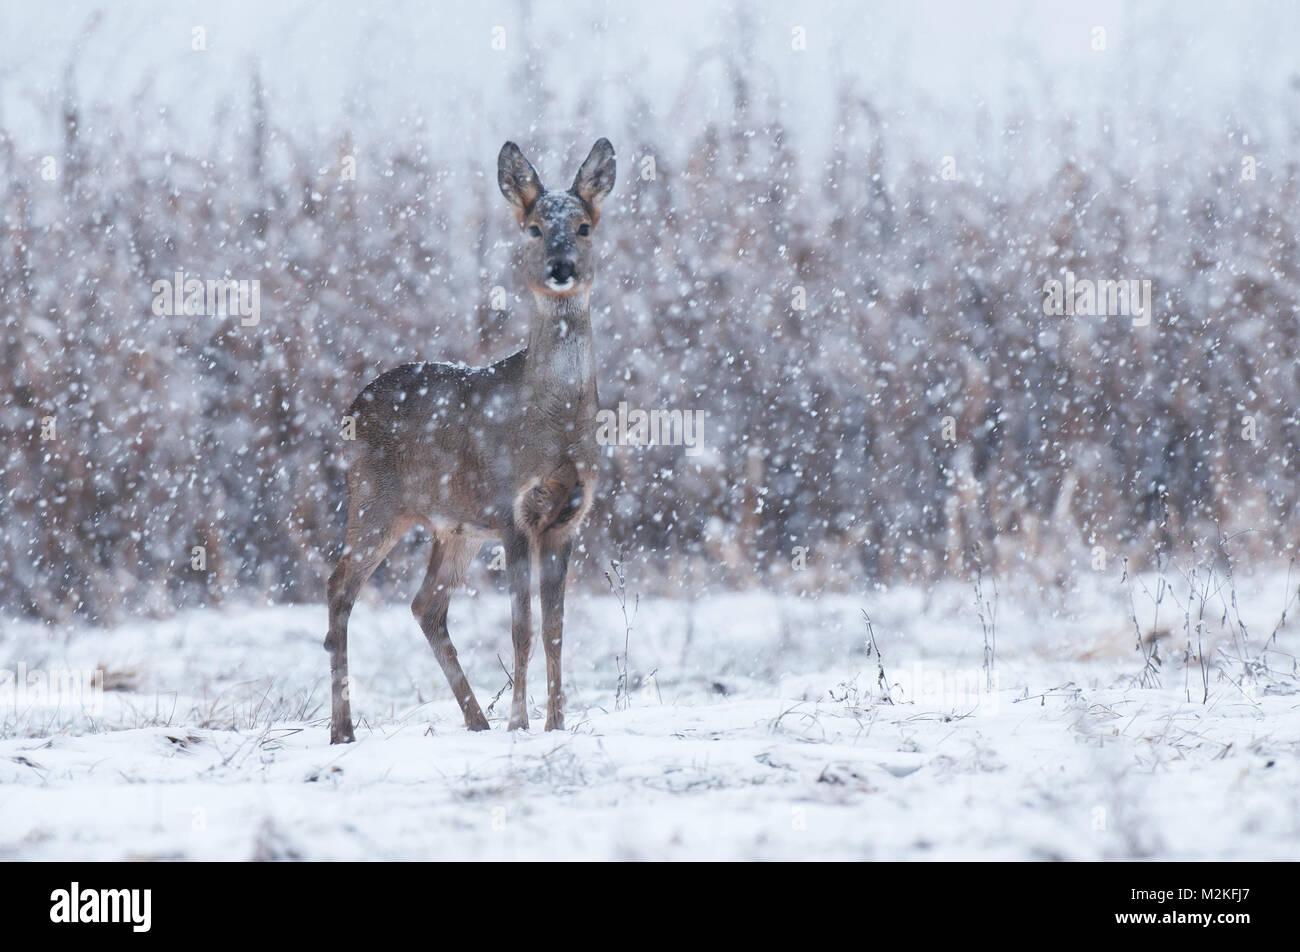 Wild roe deer in a snowstorm - Stock Image